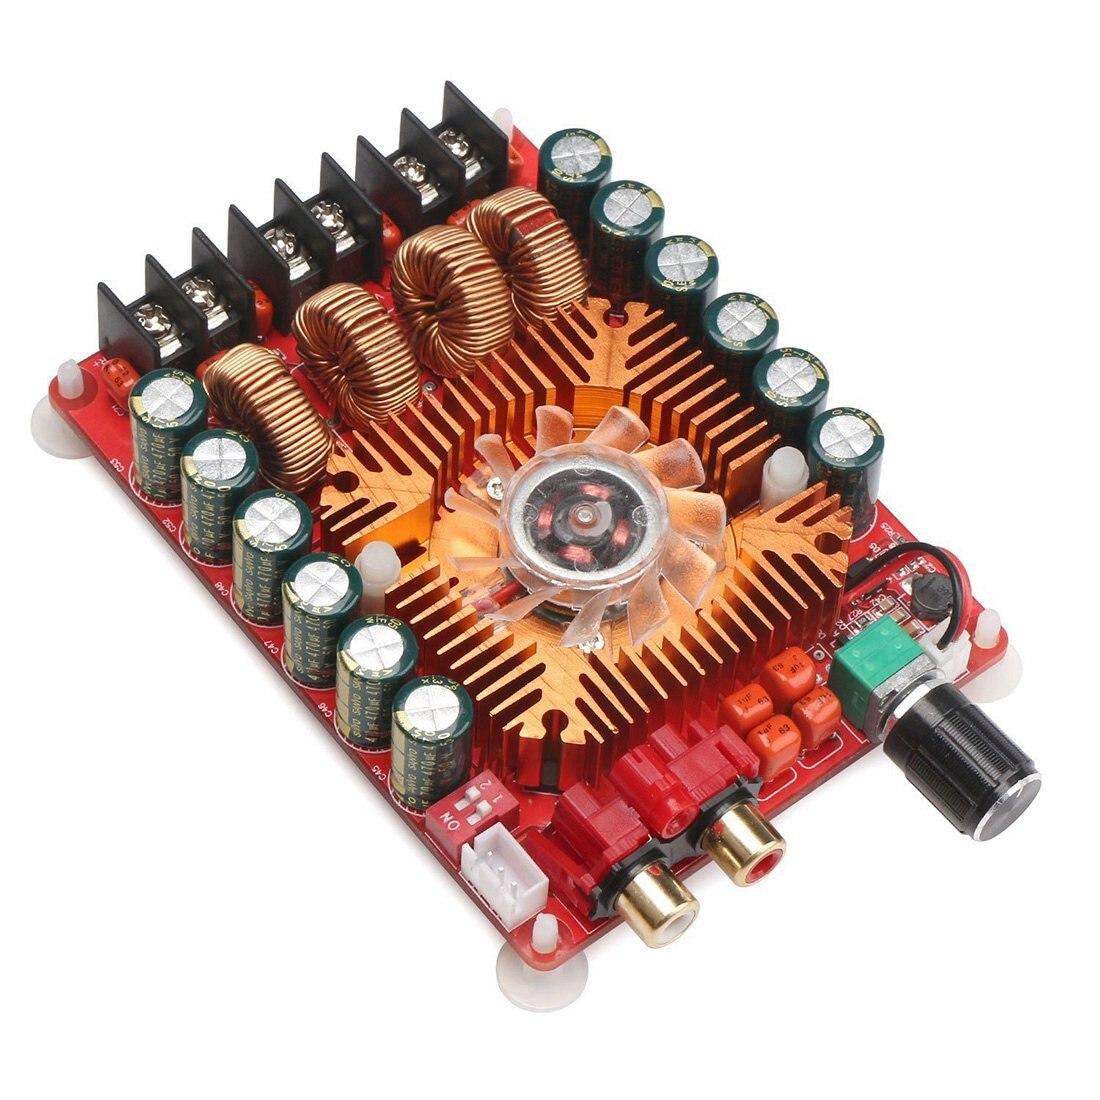 HFES New TDA7498E 2X160W Dual Channel Audio Amplifier Board, Support BTL Mode 1X220W Single Channel, DC 24V Digital Stereo Pow aiyima 12v tda7297 audio amplifier board amplificador class ab stereo dual channel amplifier board 15w 15w